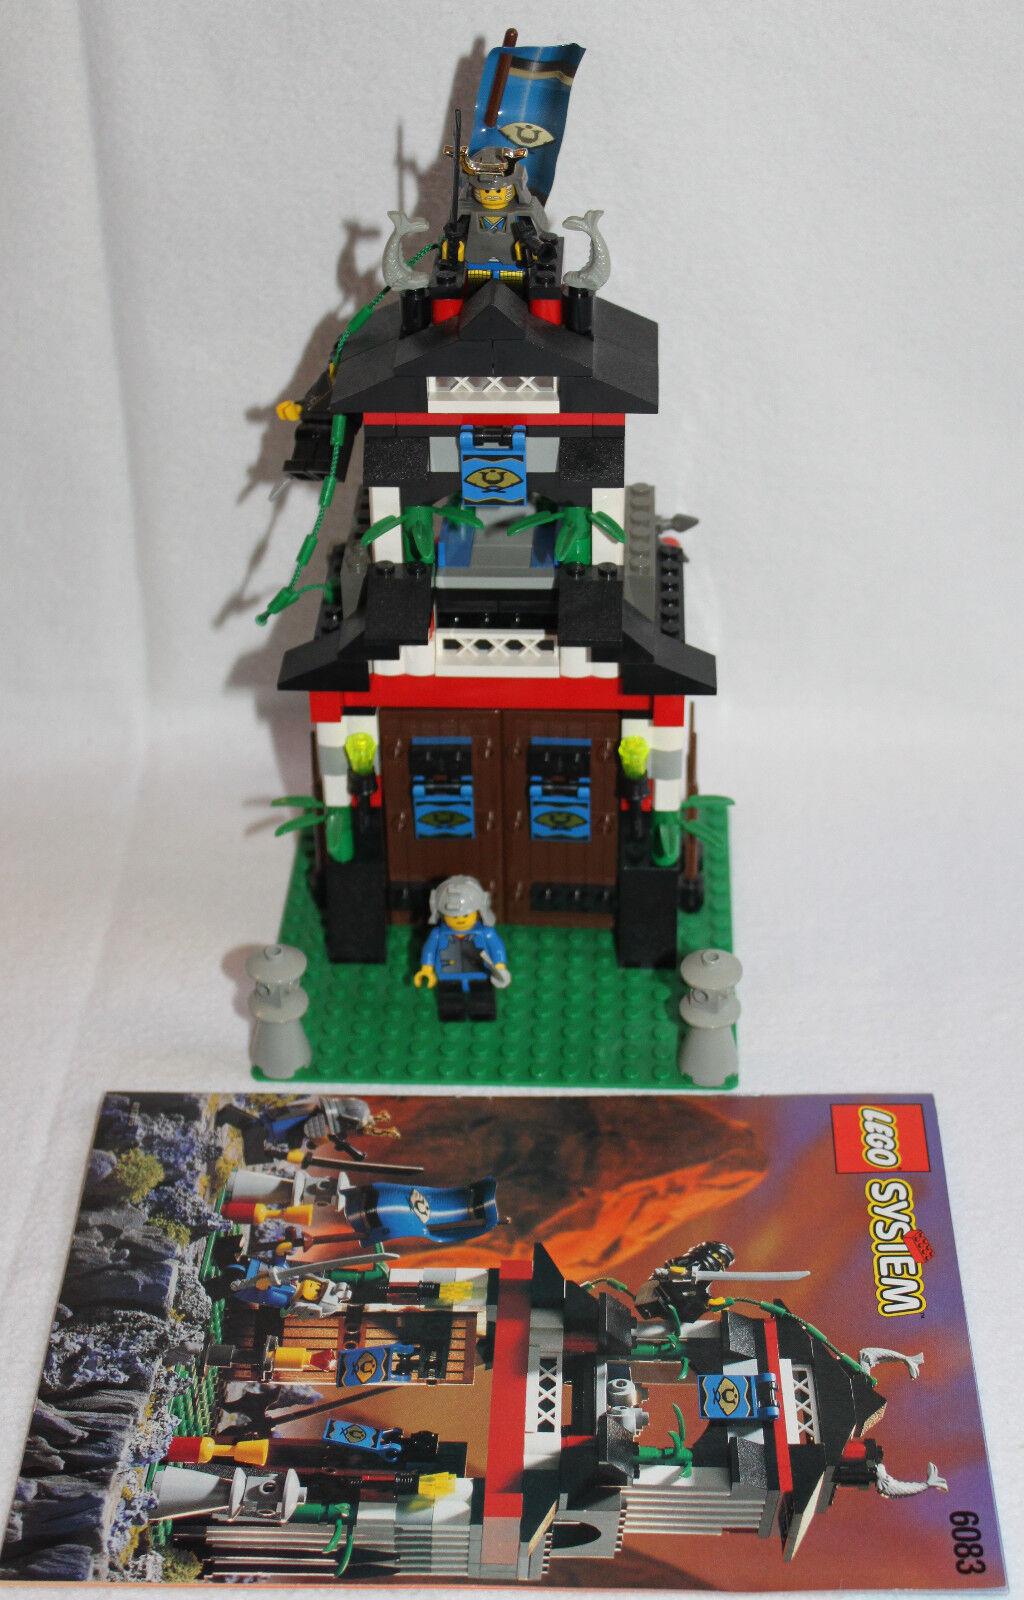 LEGO 6083 Shoguns Festung Samurai Stronghold von 1998 komplett + Bauanleitung